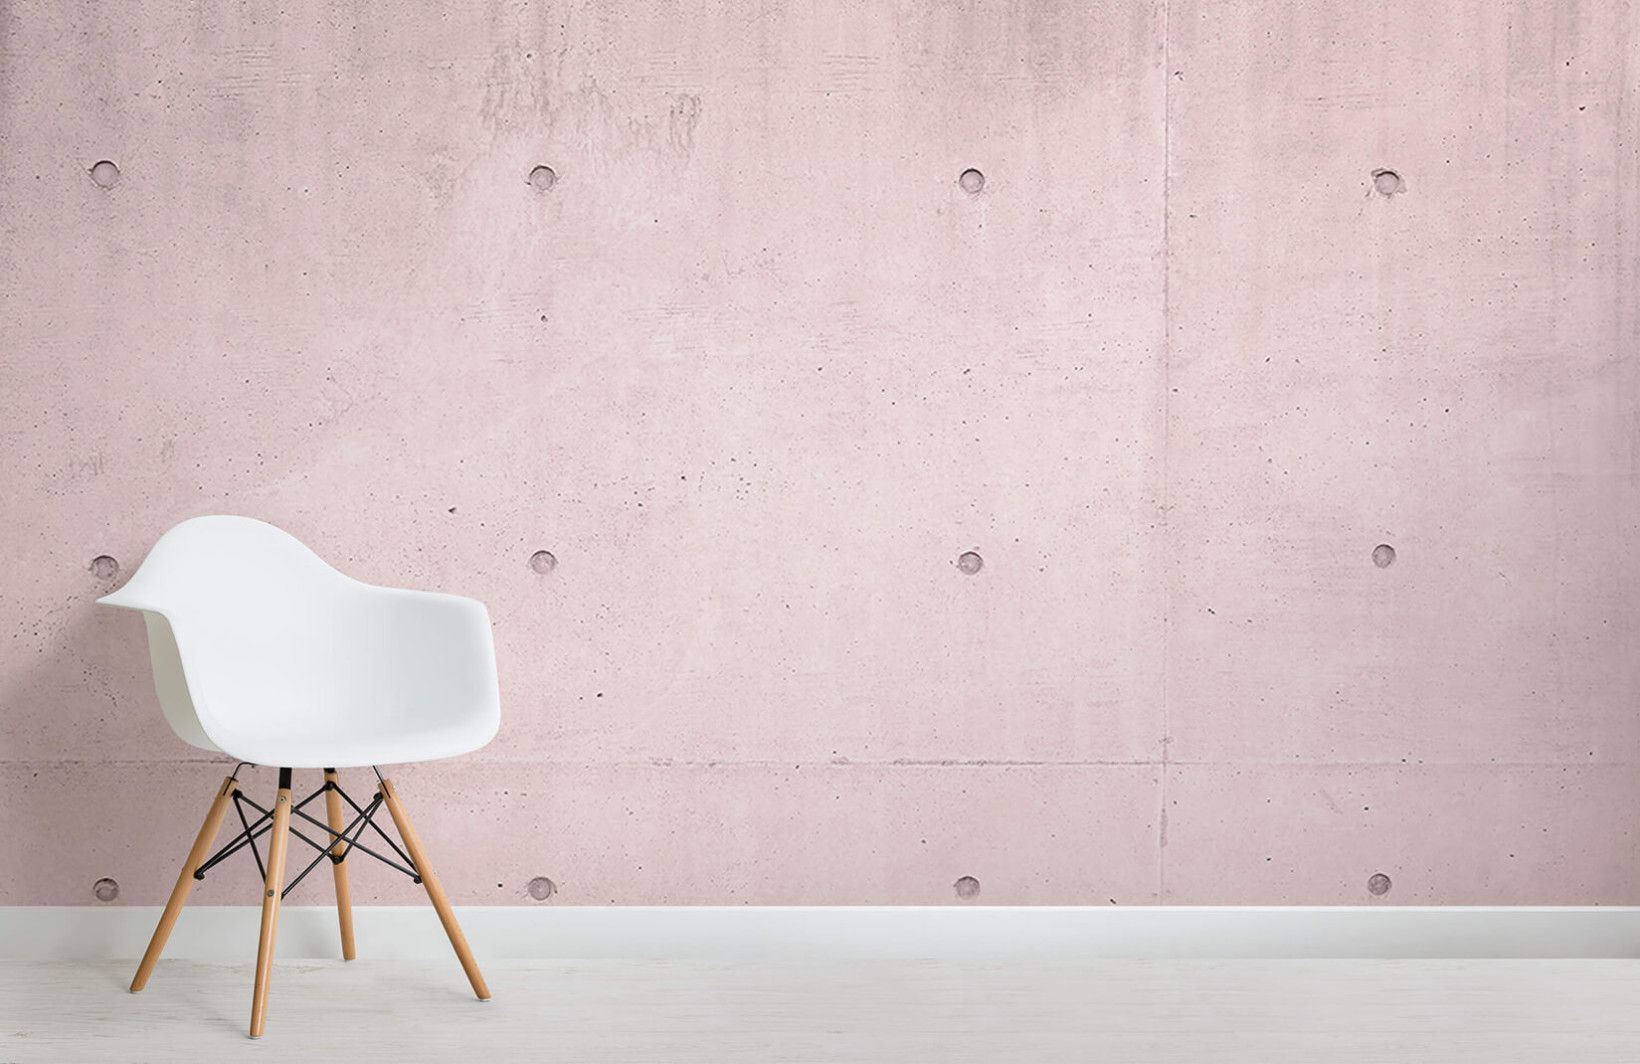 Pink Modern Concrete Block Room Interiorarchitecture Rustic Living Room Furniture Brick Wallpaper Mural Concrete Block Walls